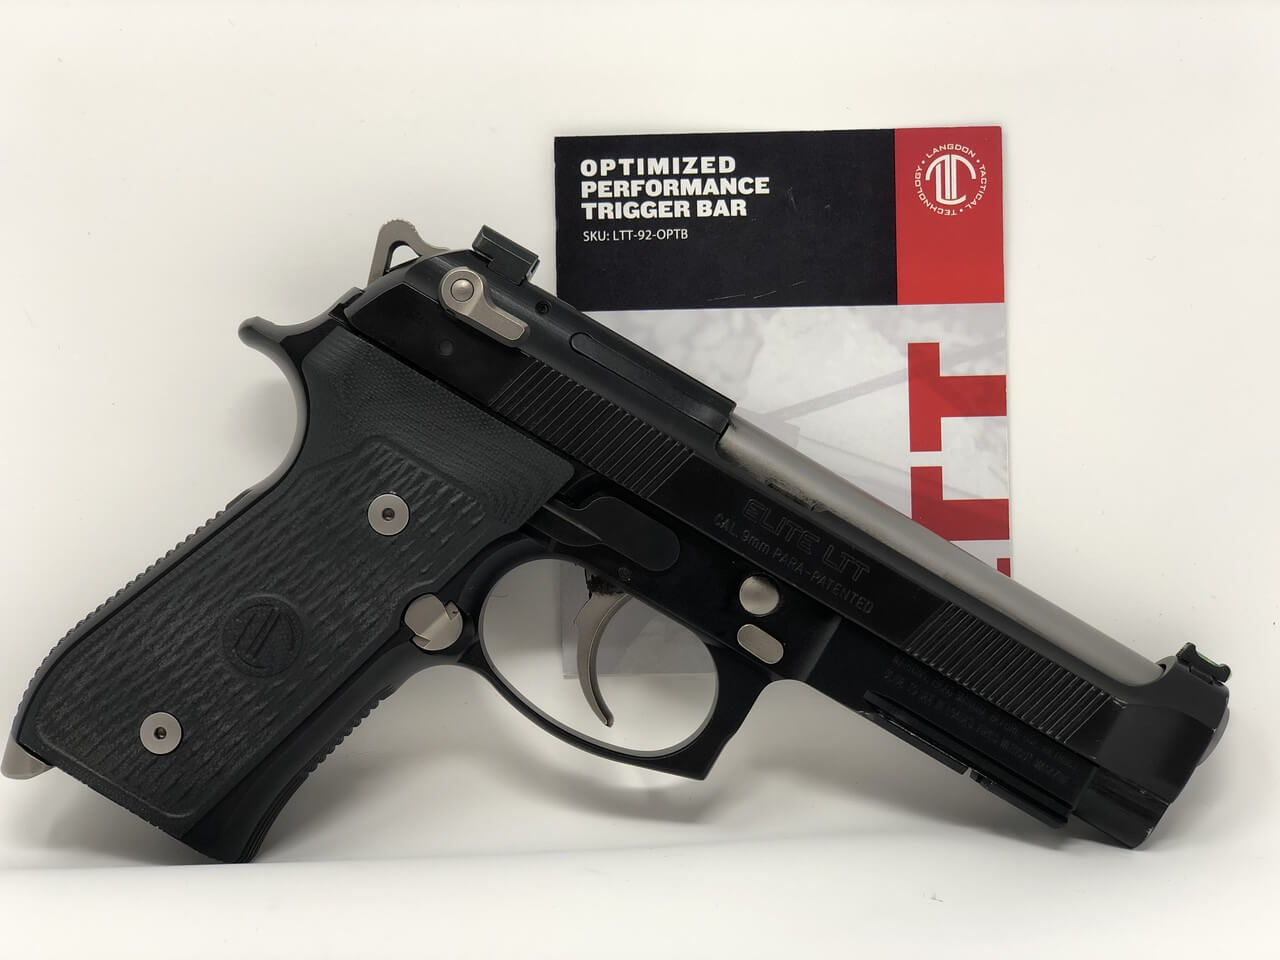 Make Your Beretta 92 Even Faster: LTT's Optimized Performance Trigger Bar